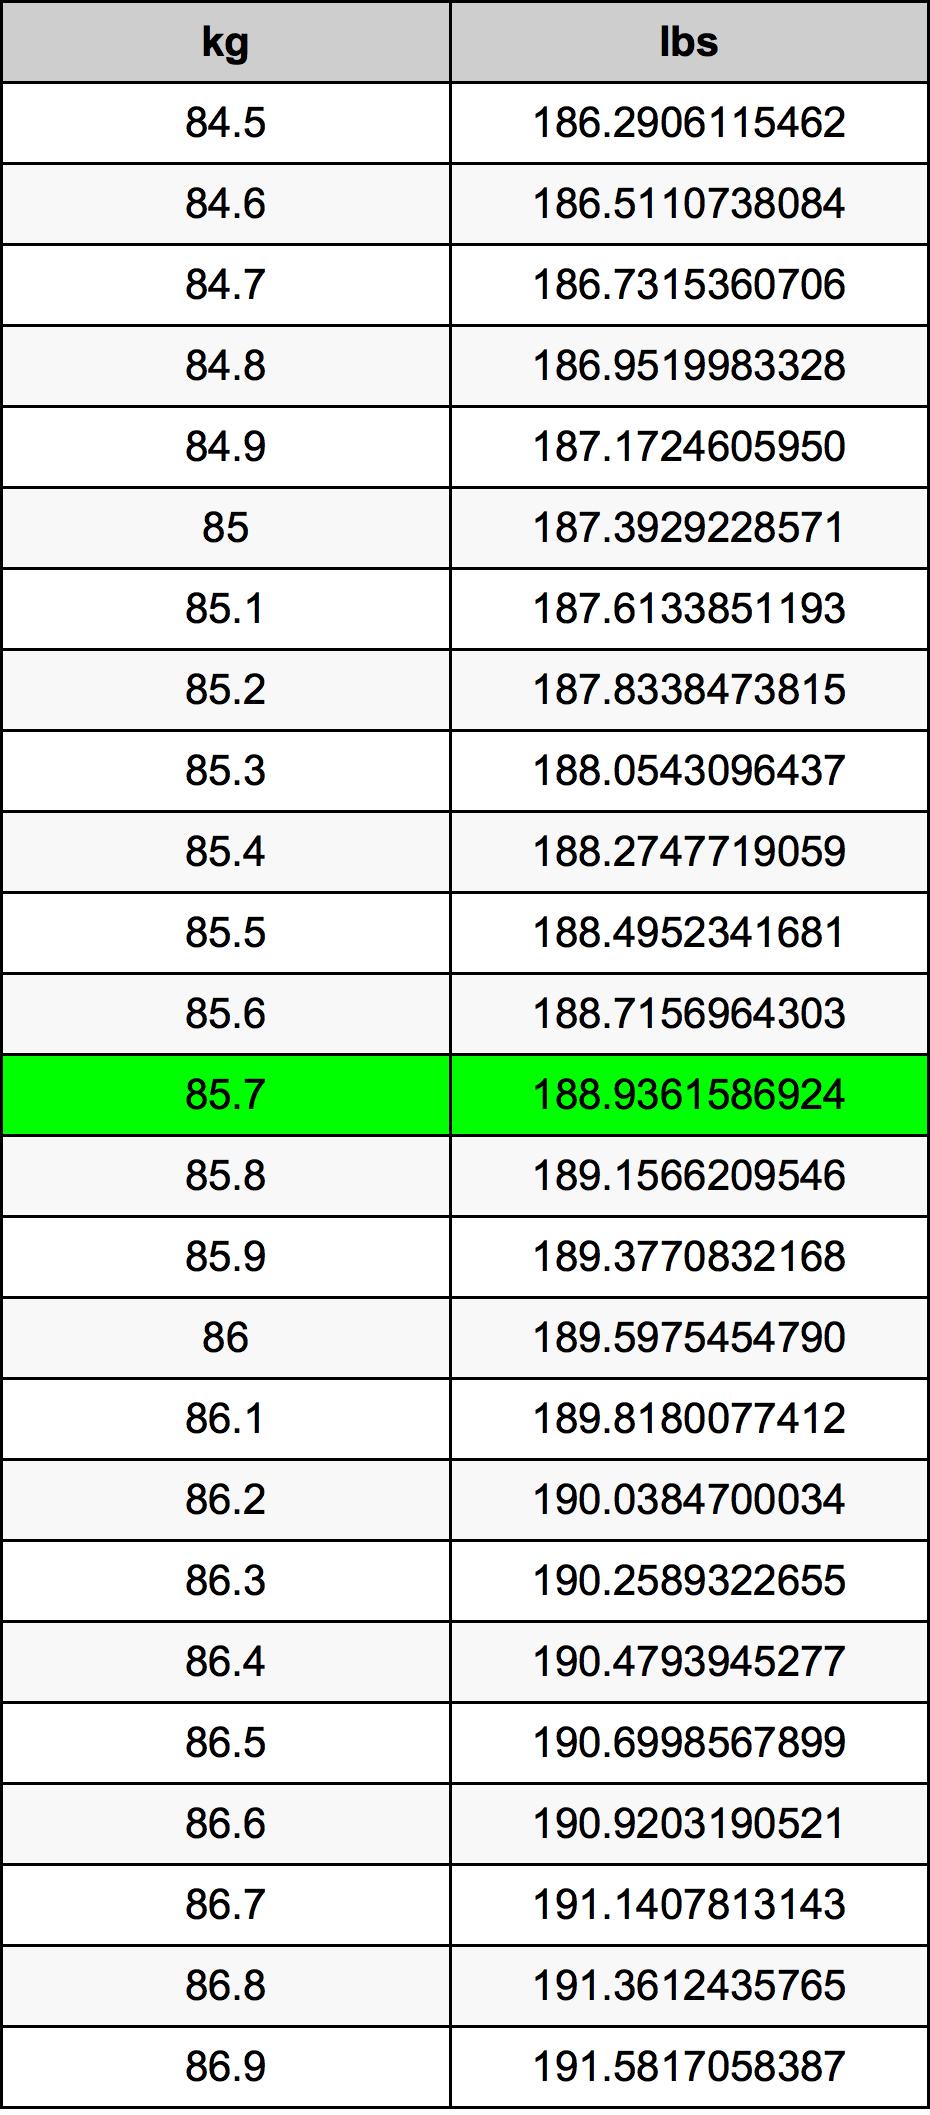 85.7 Kilogrami Table